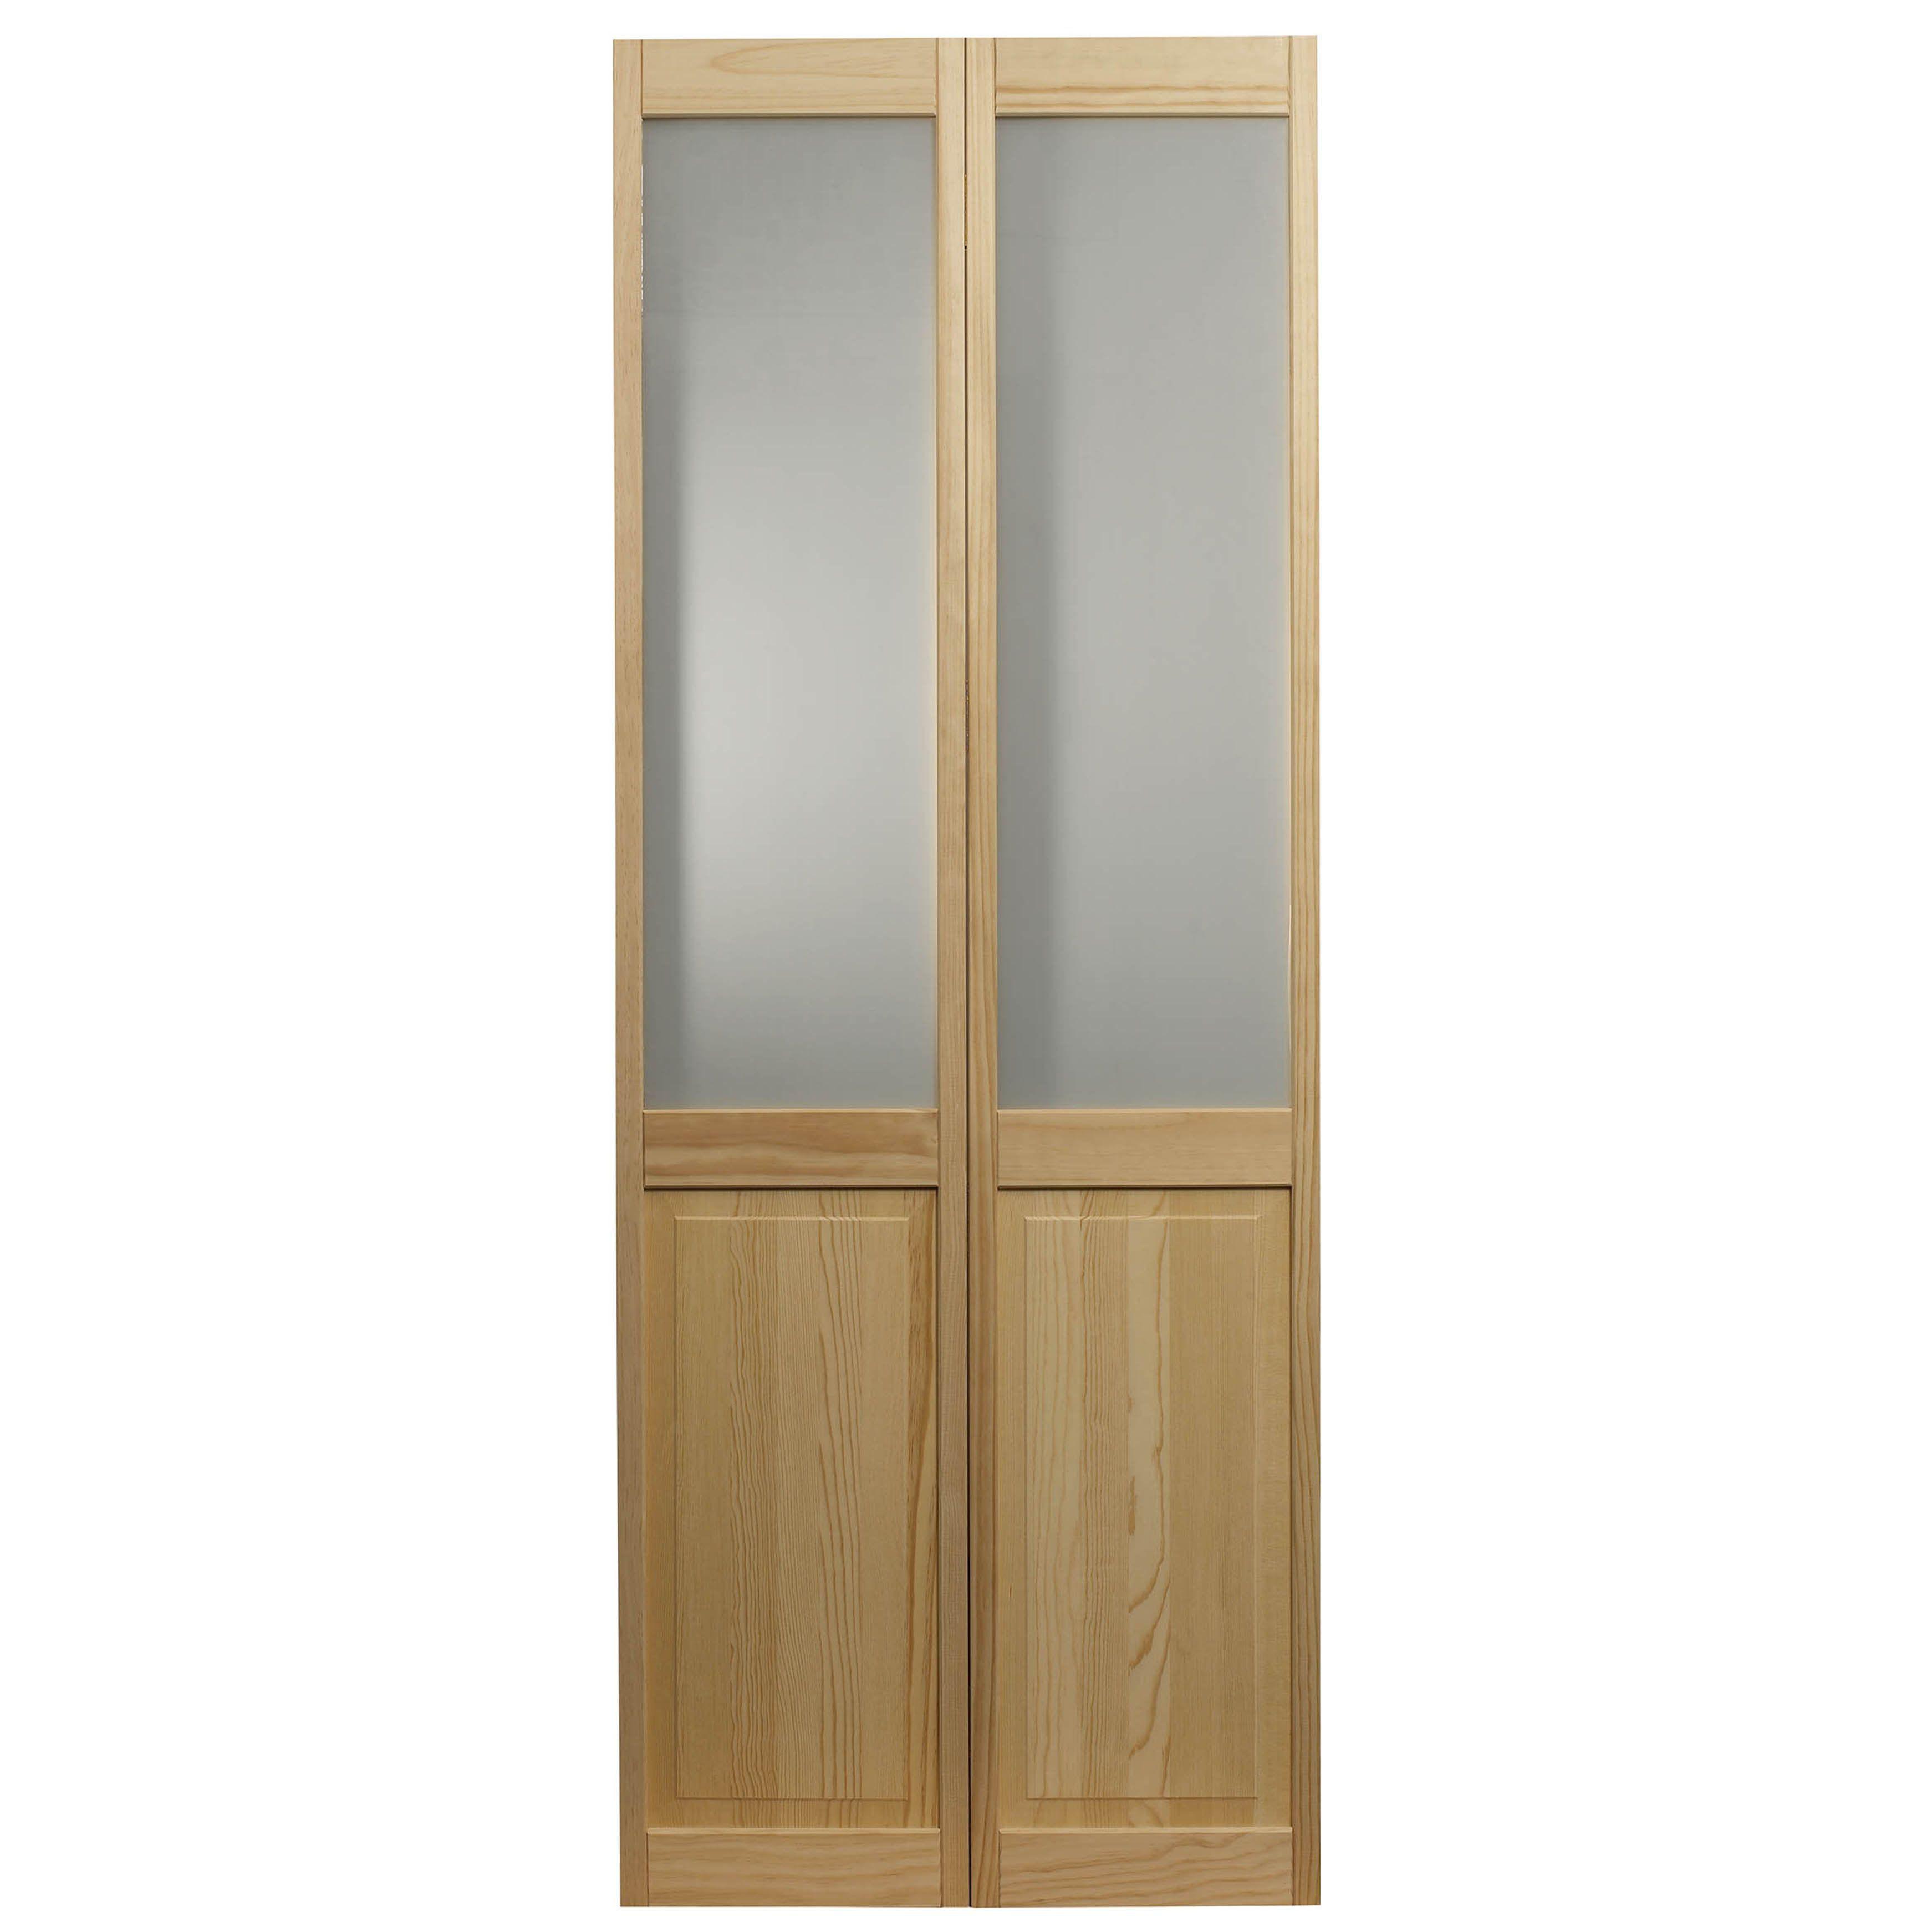 Online Shopping Bedding Furniture Electronics Jewelry Clothing More Bifold Door Hardware Frosted Glass Door Panel Doors